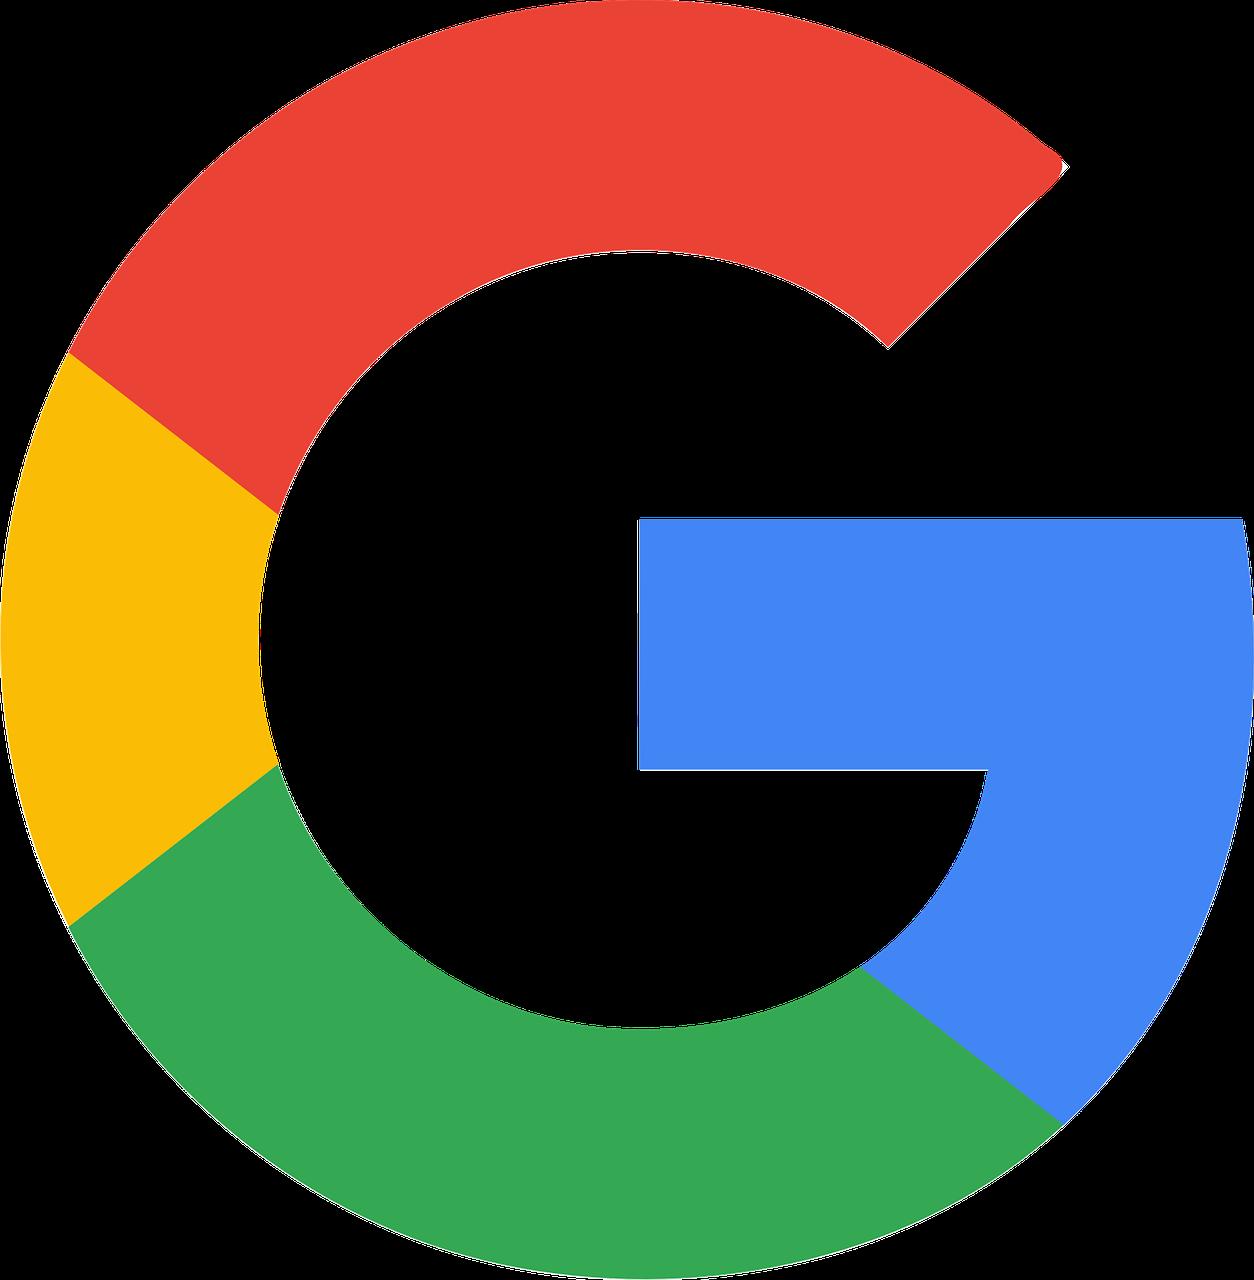 Favicon icon image picpng. Google logo png 2015